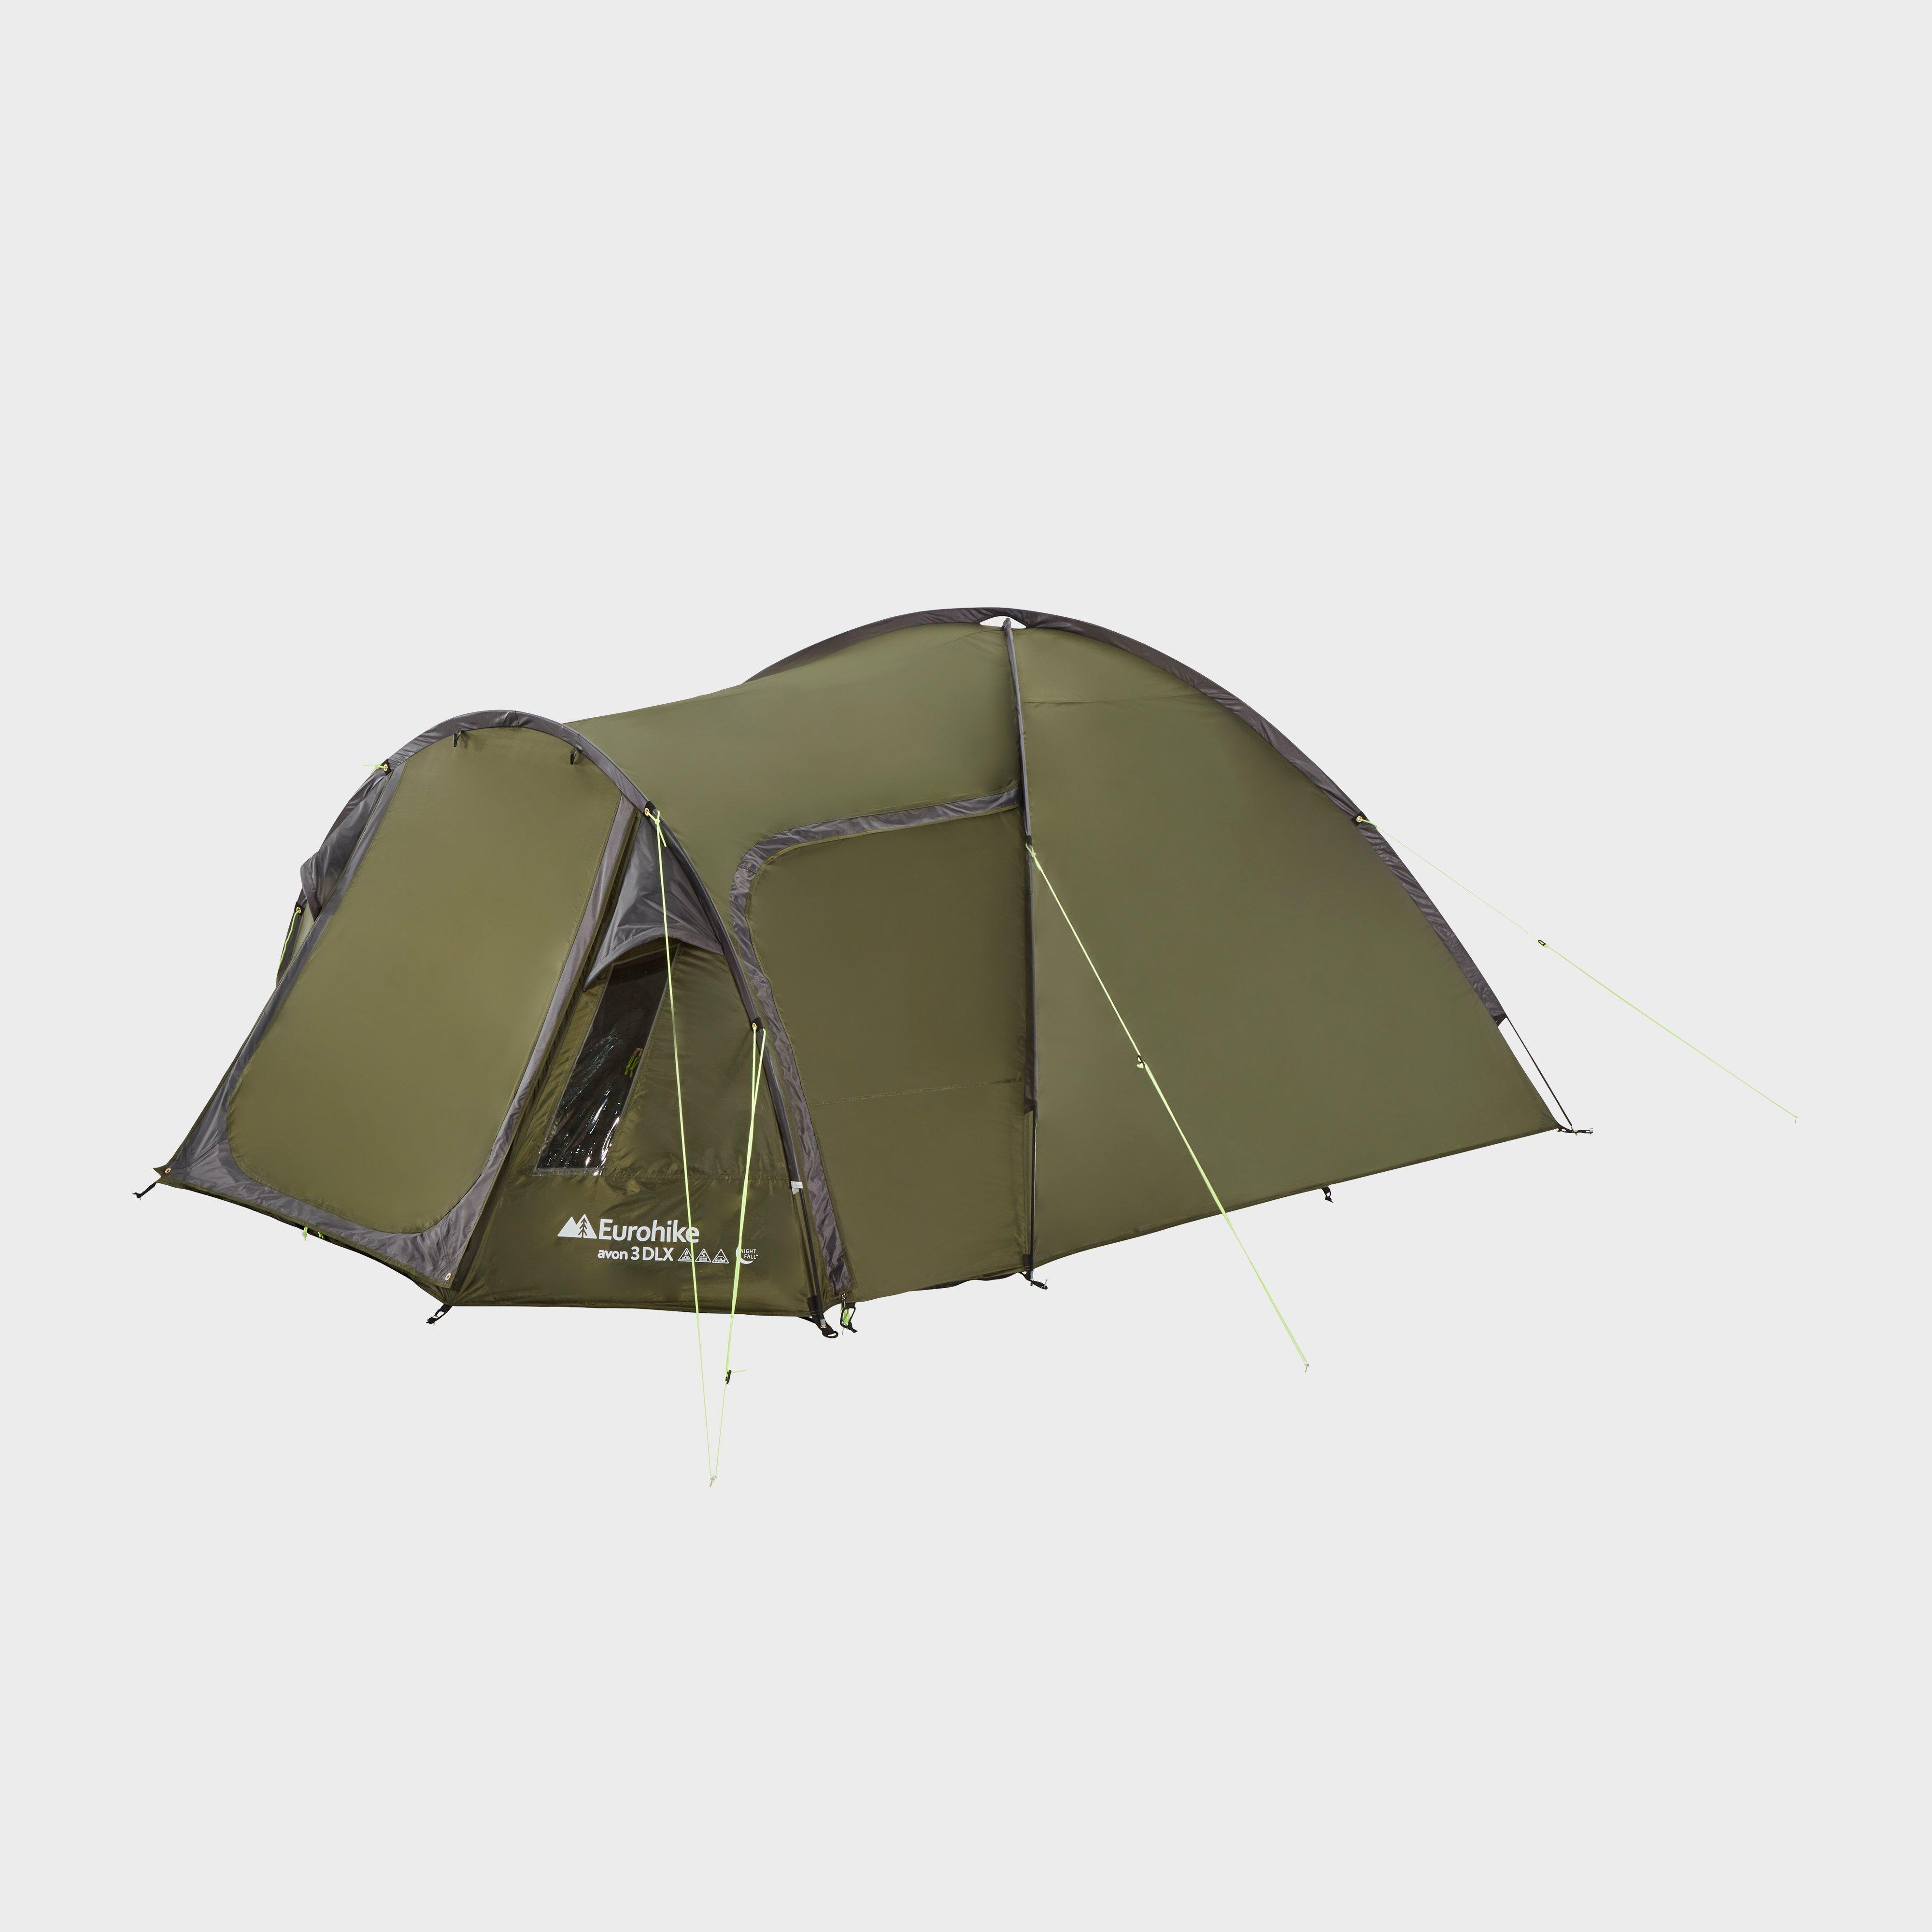 Eurohike Eurohike Avon 3 DLX Nightfall Tent, Green